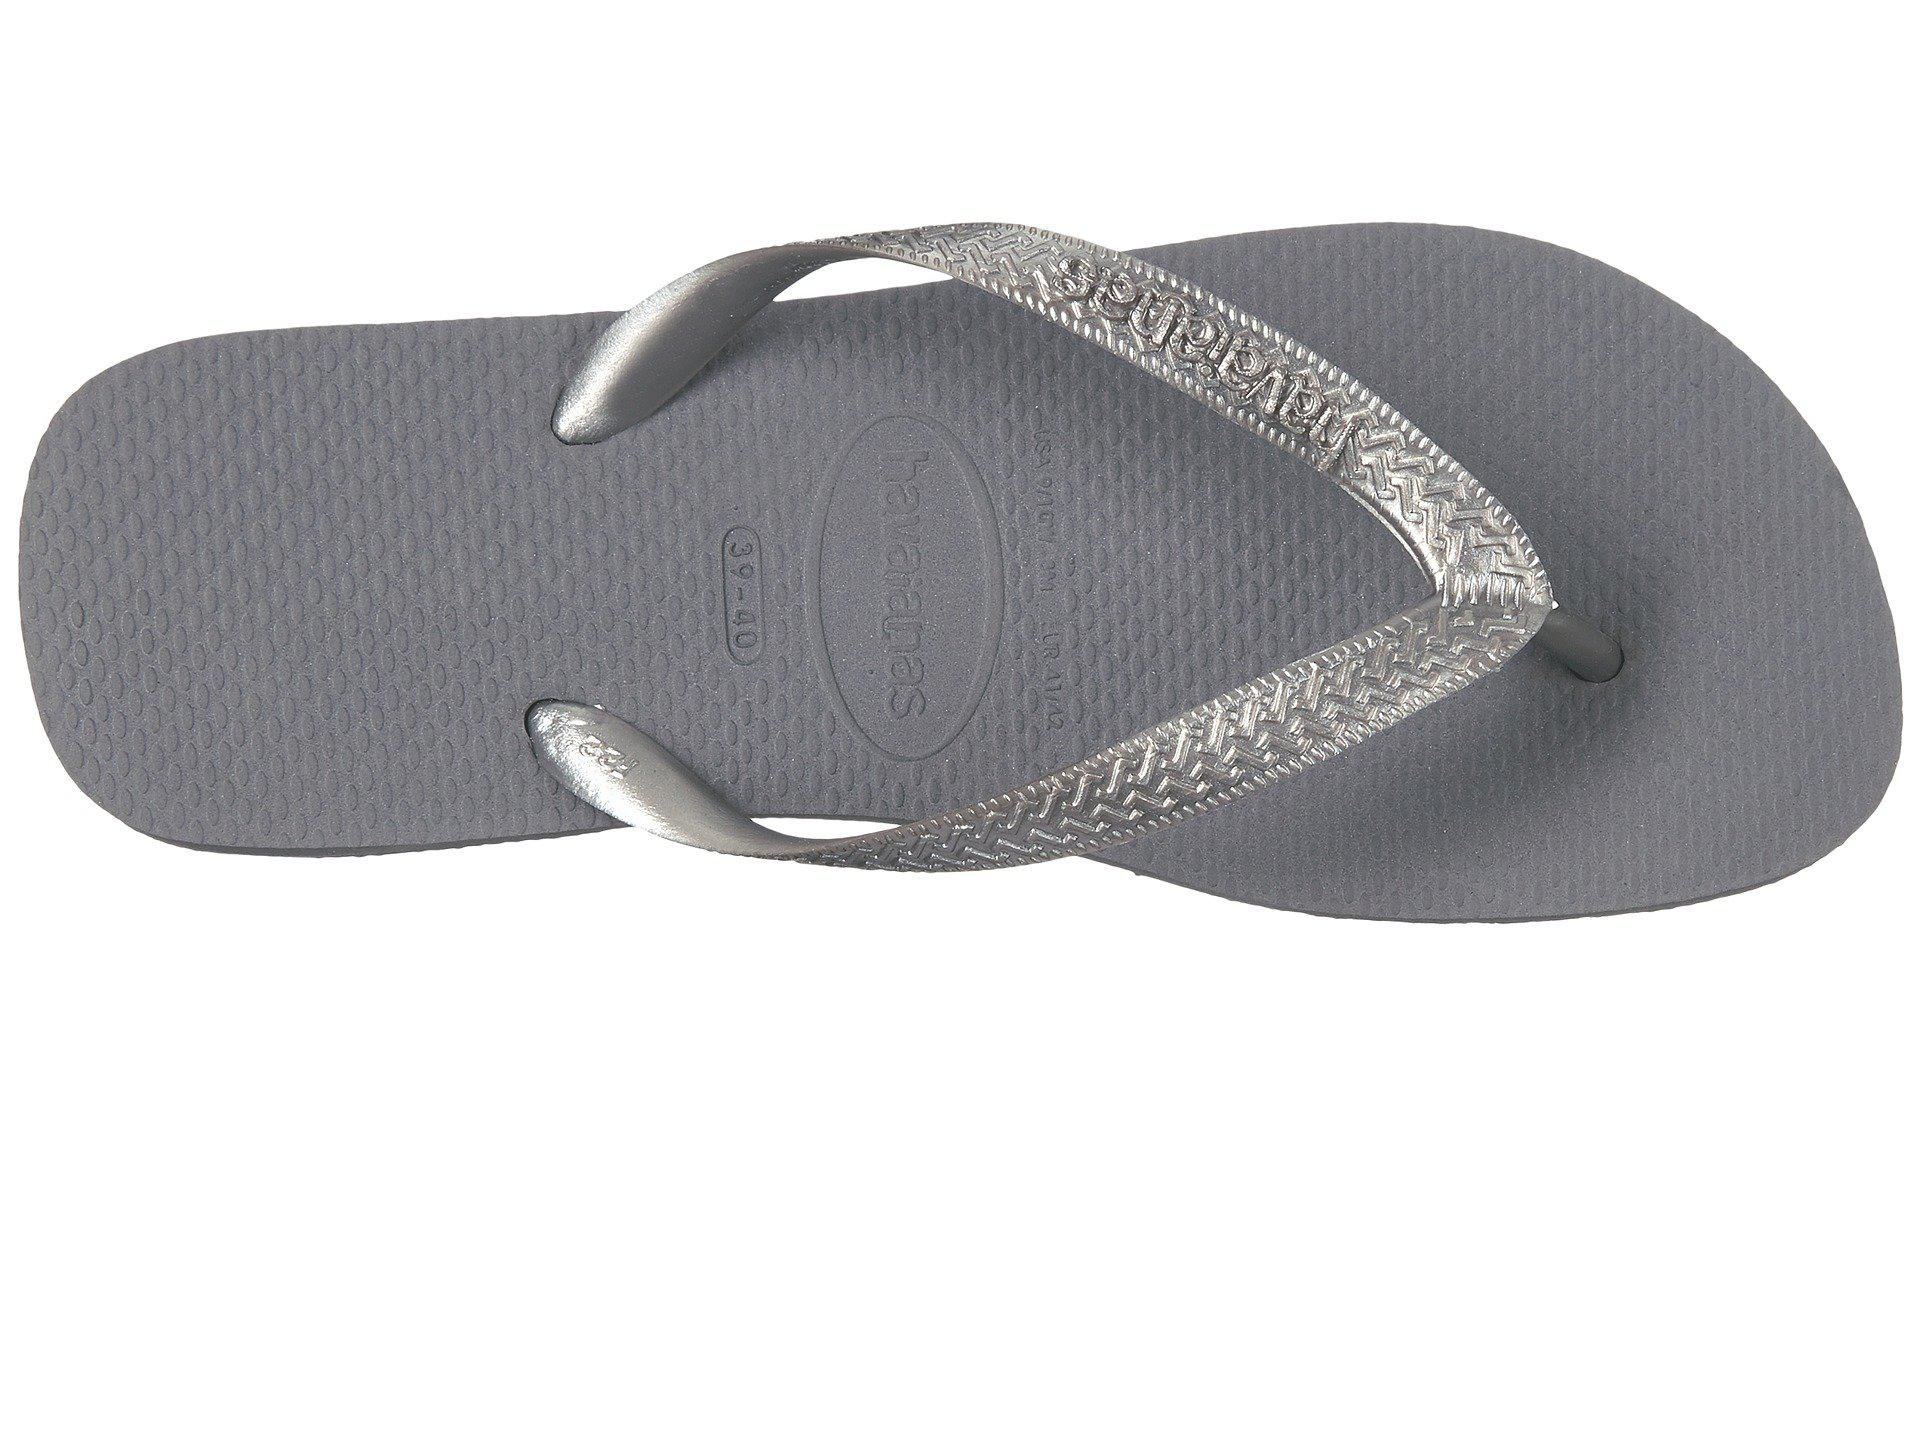 b5d4110b74cf9b Lyst - Havaianas Top Tiras Flip-flops (steel Grey) Women s Sandals ...